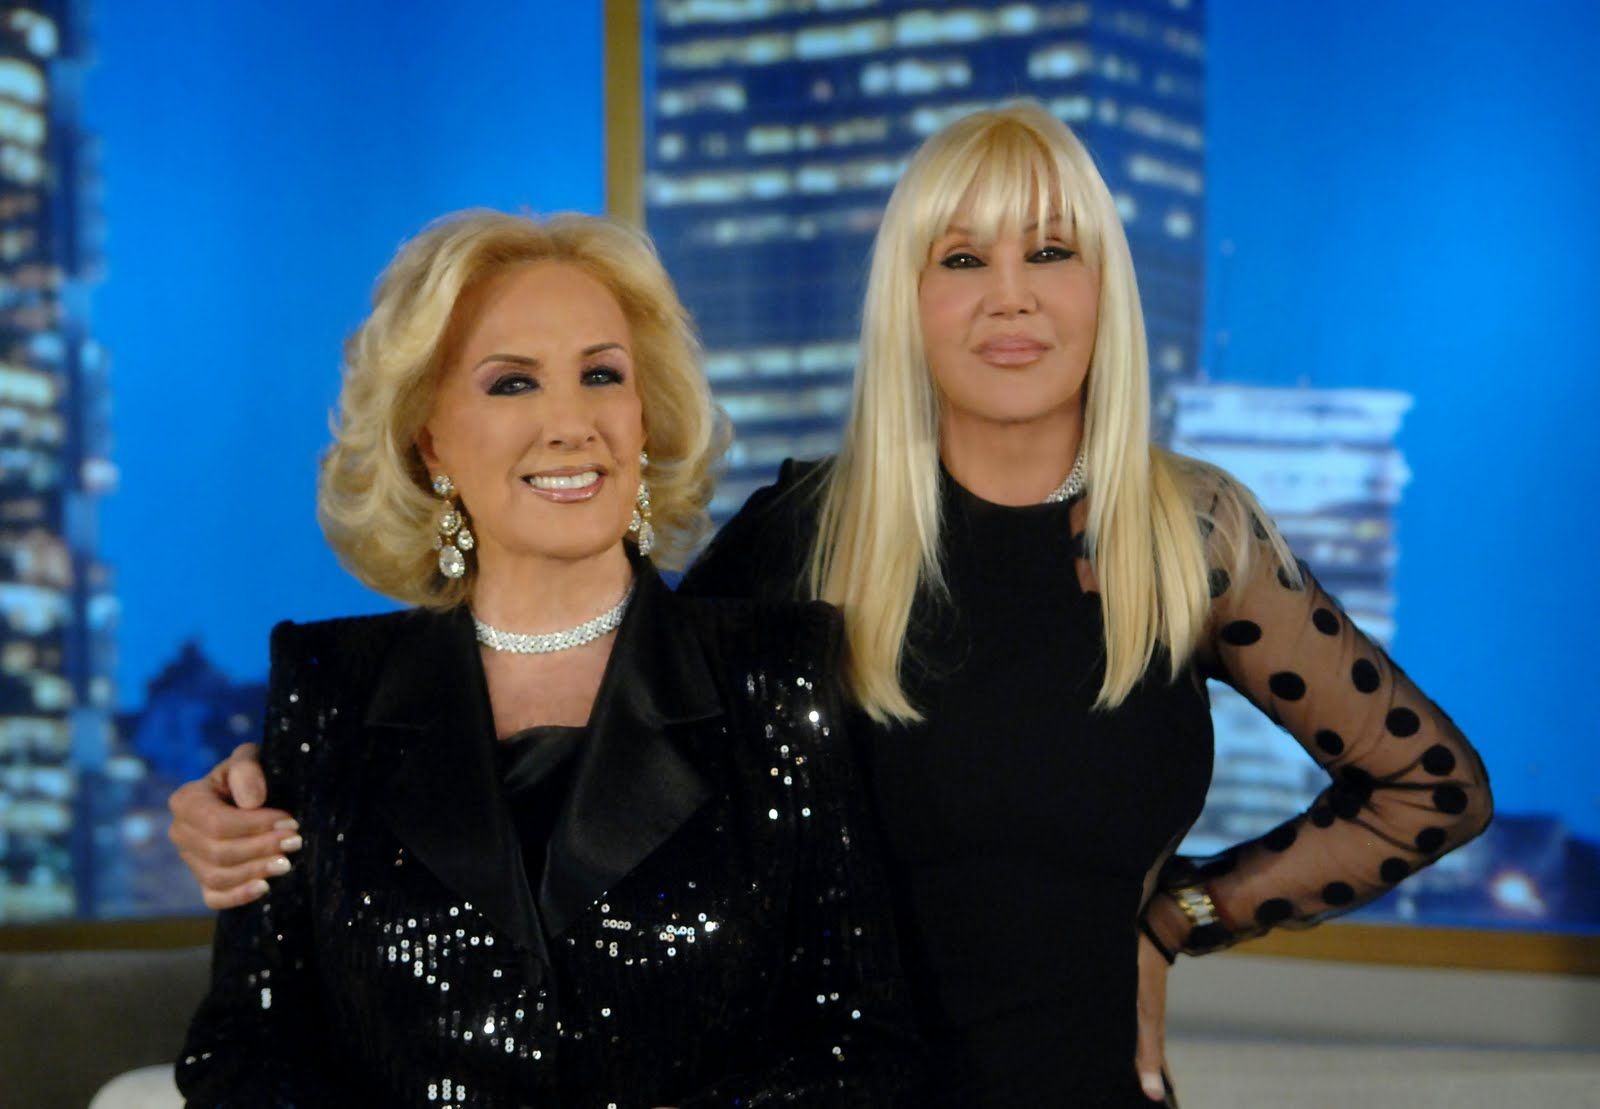 Mirtha Legrand y Susana Giménez